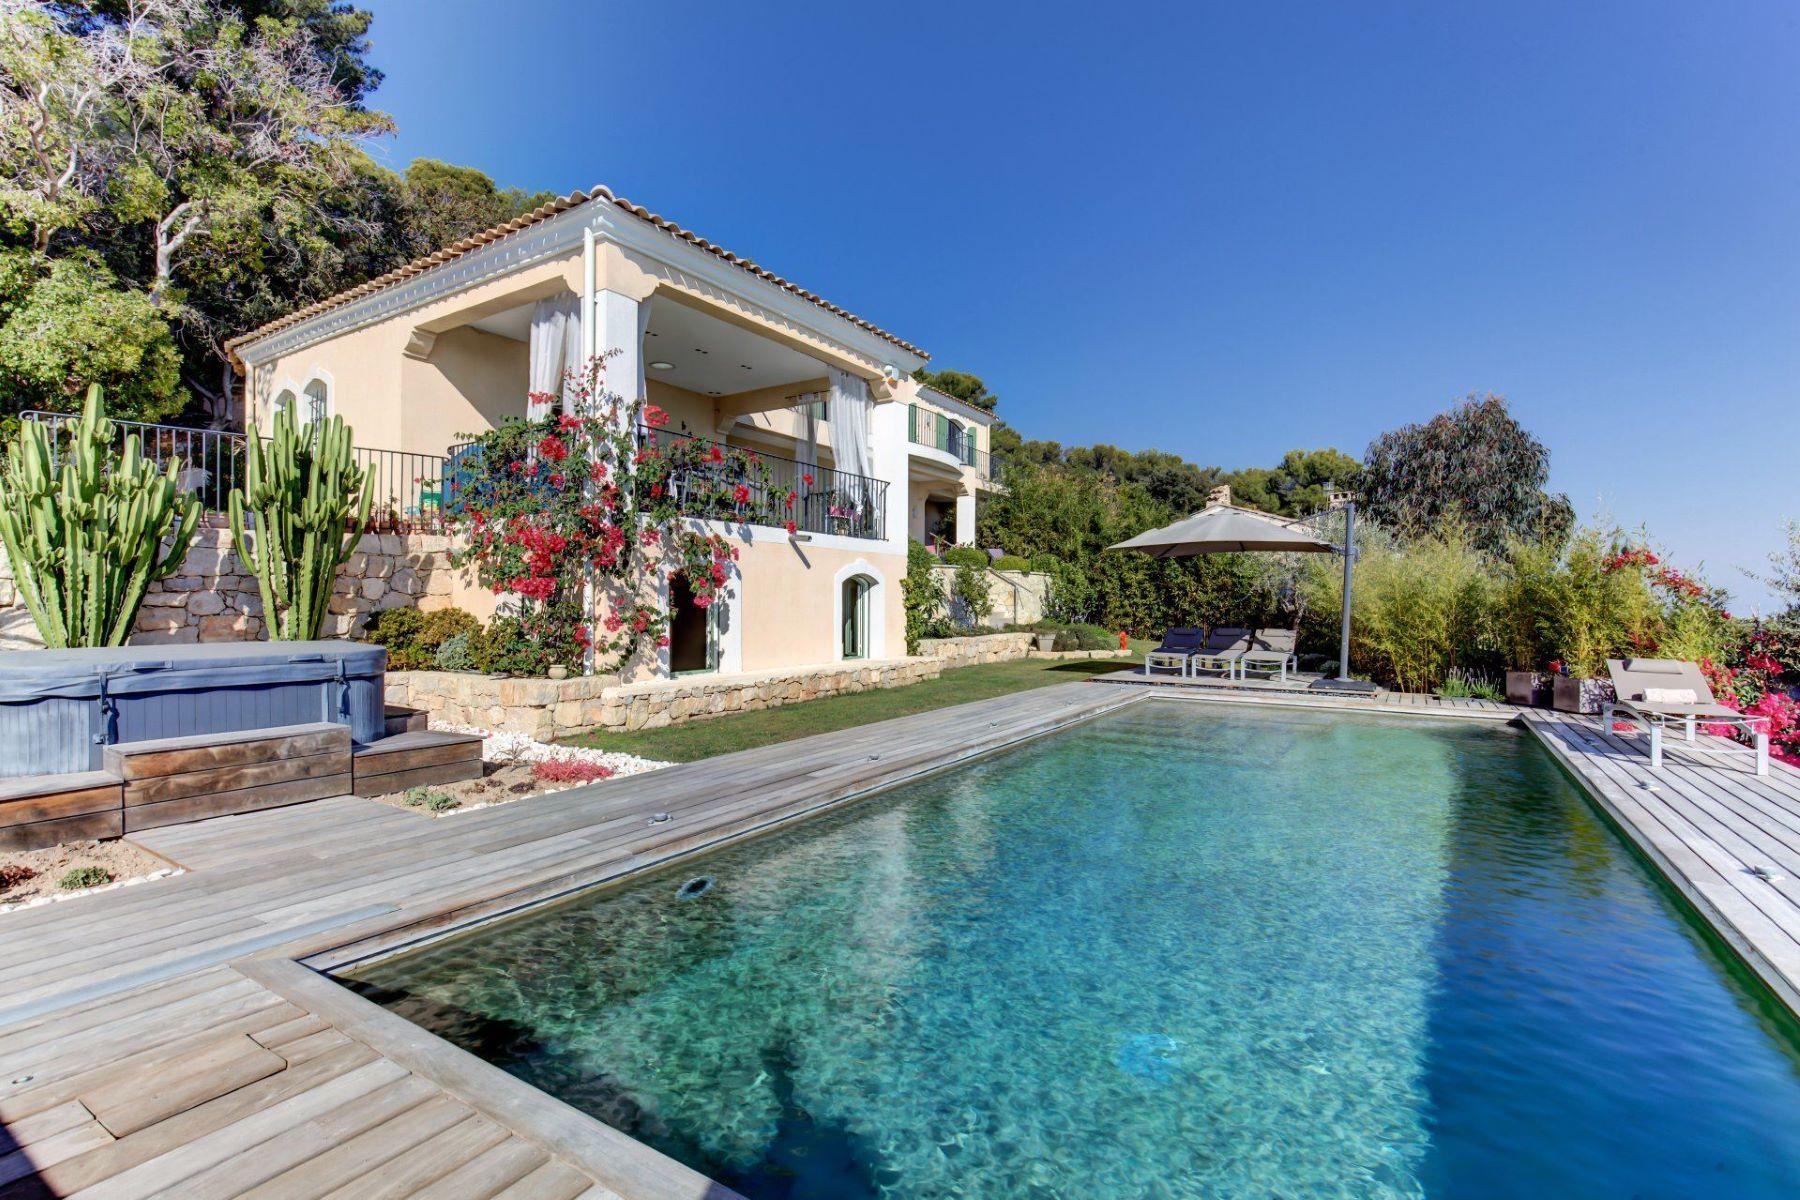 Single Family Homes por un Venta en Villa for sale on the heights of Golfe Juan - Paoramic sea views Golfe Juan, Provincia - Alpes - Costa Azul 06220 Francia